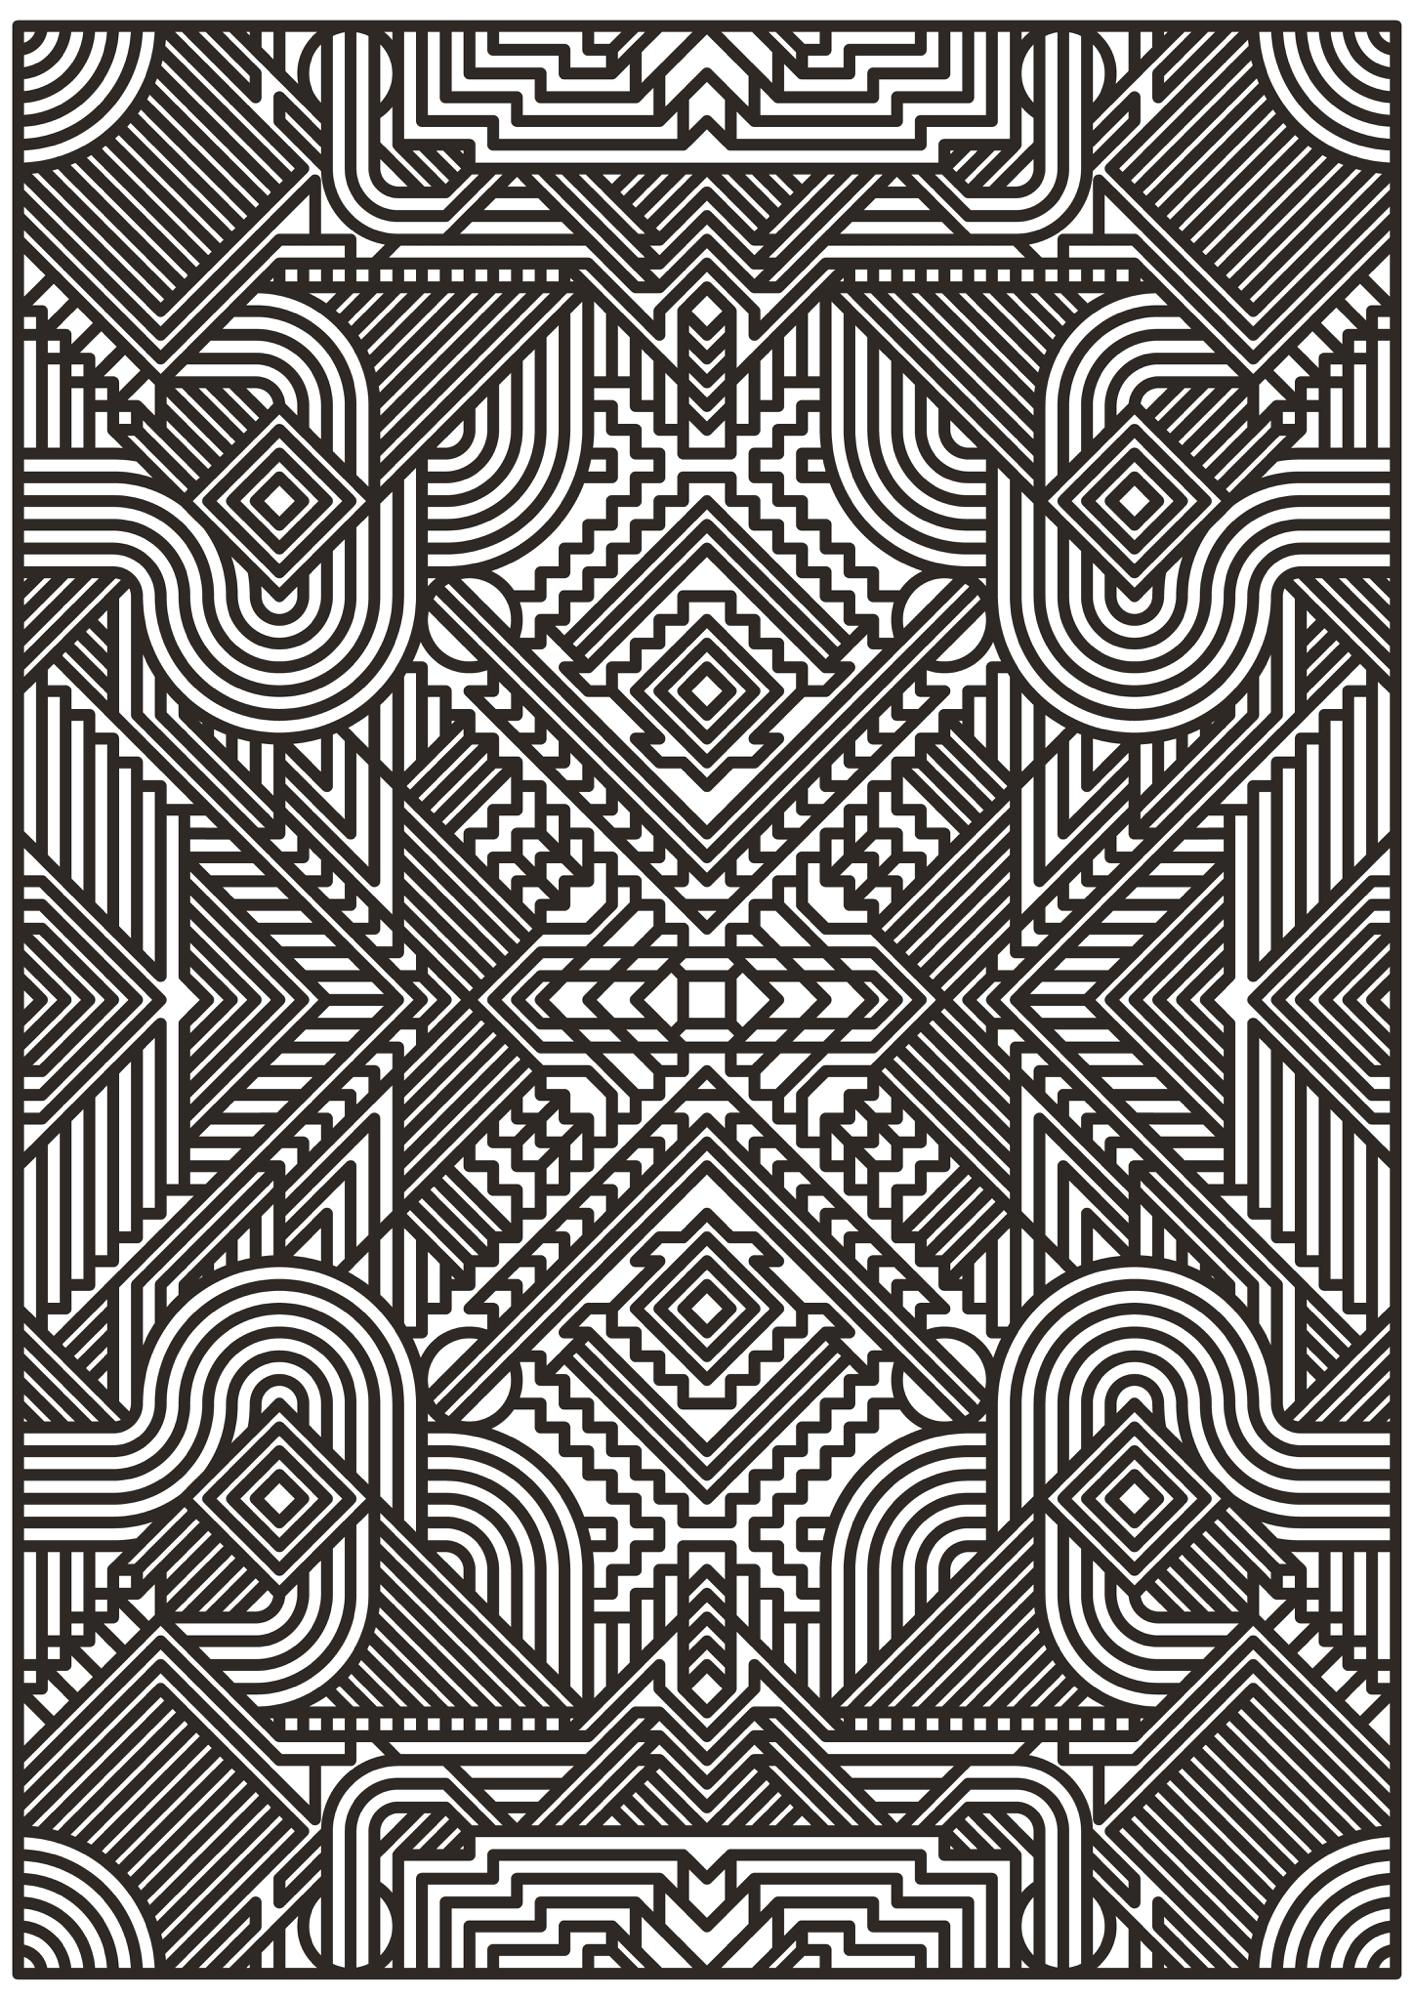 owel - posterdesign, pattern, vector - madebytak | ello